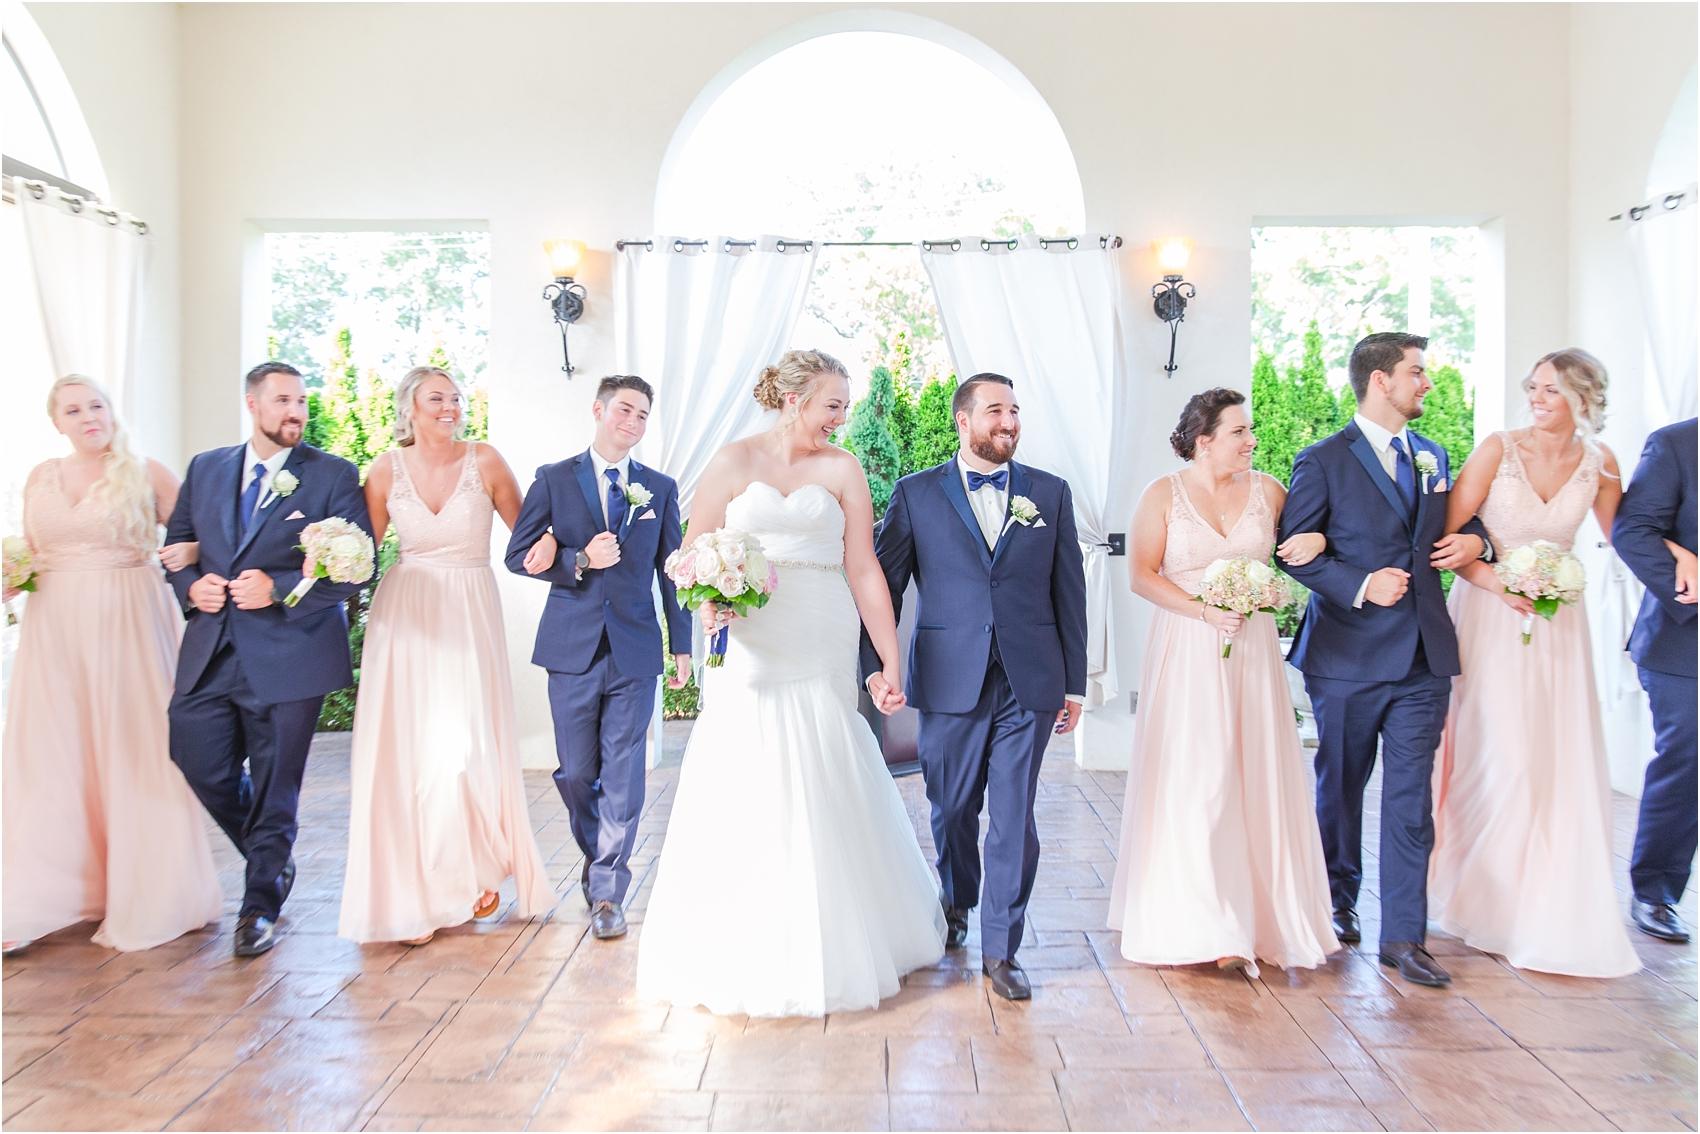 joyful-and-candid-navy-blush-wedding-photos-at-crystal-gardens-in-howell-mi-by-courtney-carolyn-photography_0074.jpg